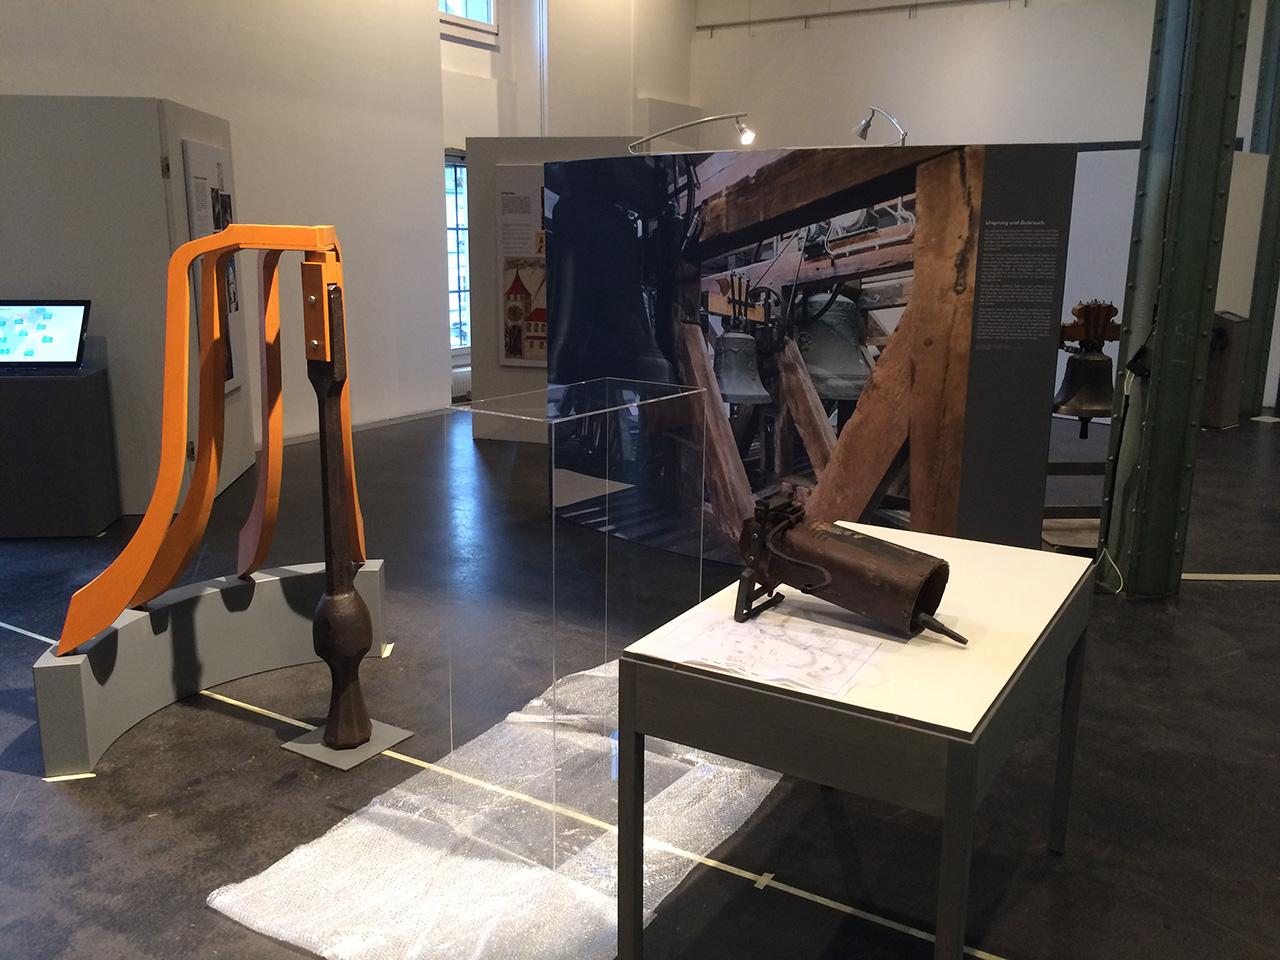 Museen Ausstellungen - Glockenausstellung Bim Ban Wumm